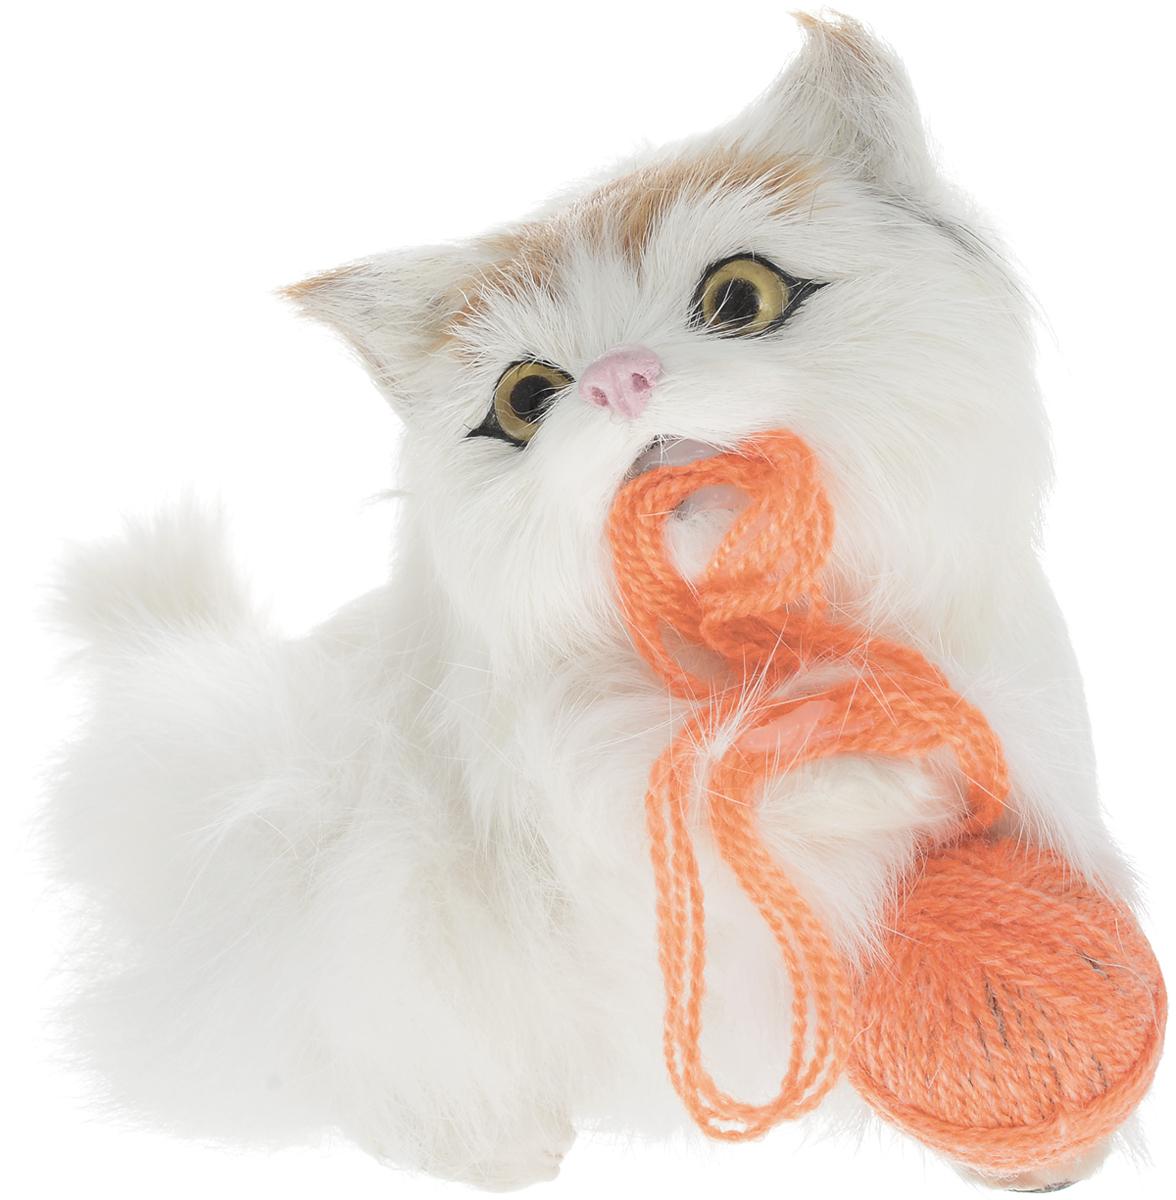 Vebtoy Фигурка Котенок с клубочком цвет белый C223 vebtoy фигурка котенок сидящий цвет белый c226